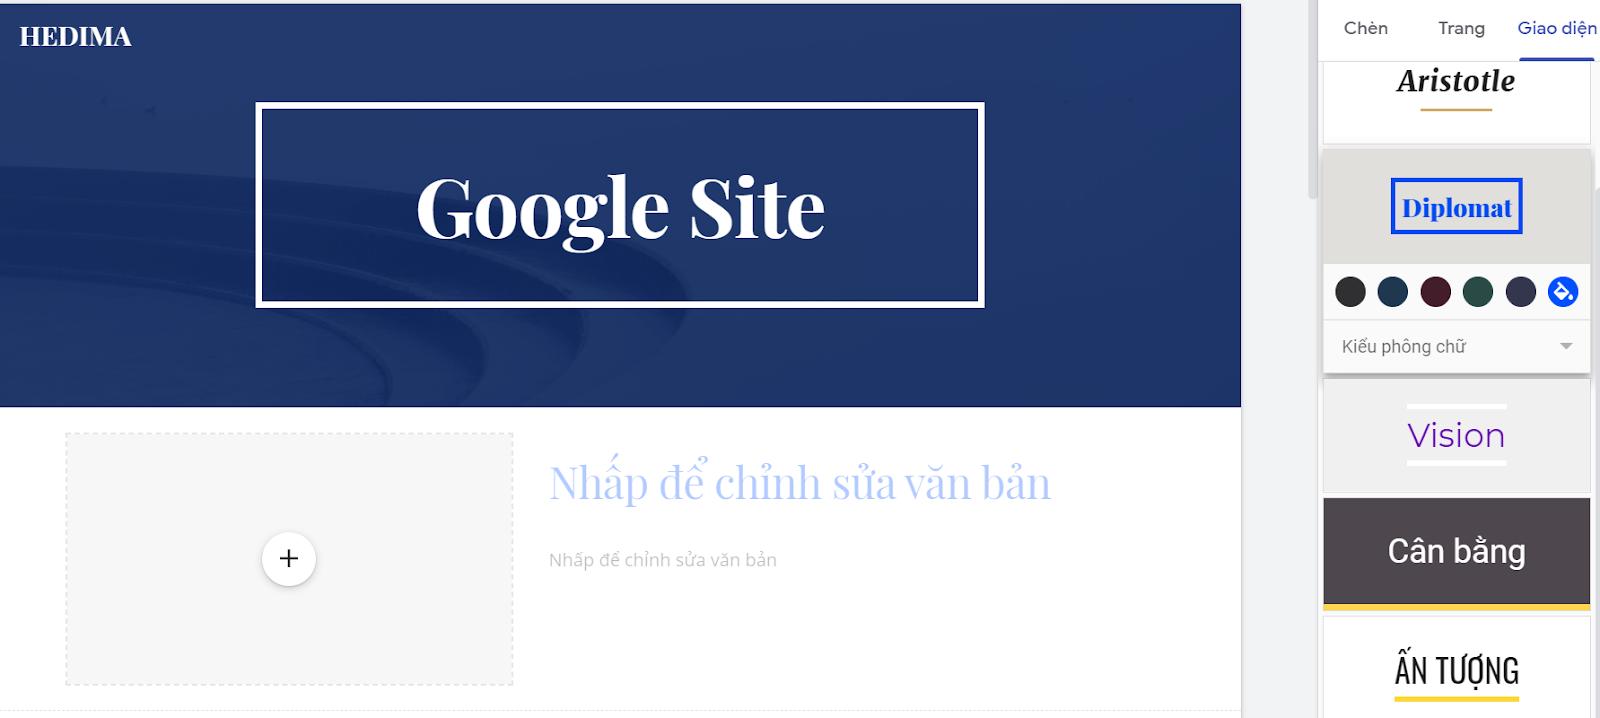 Theme của Google Site